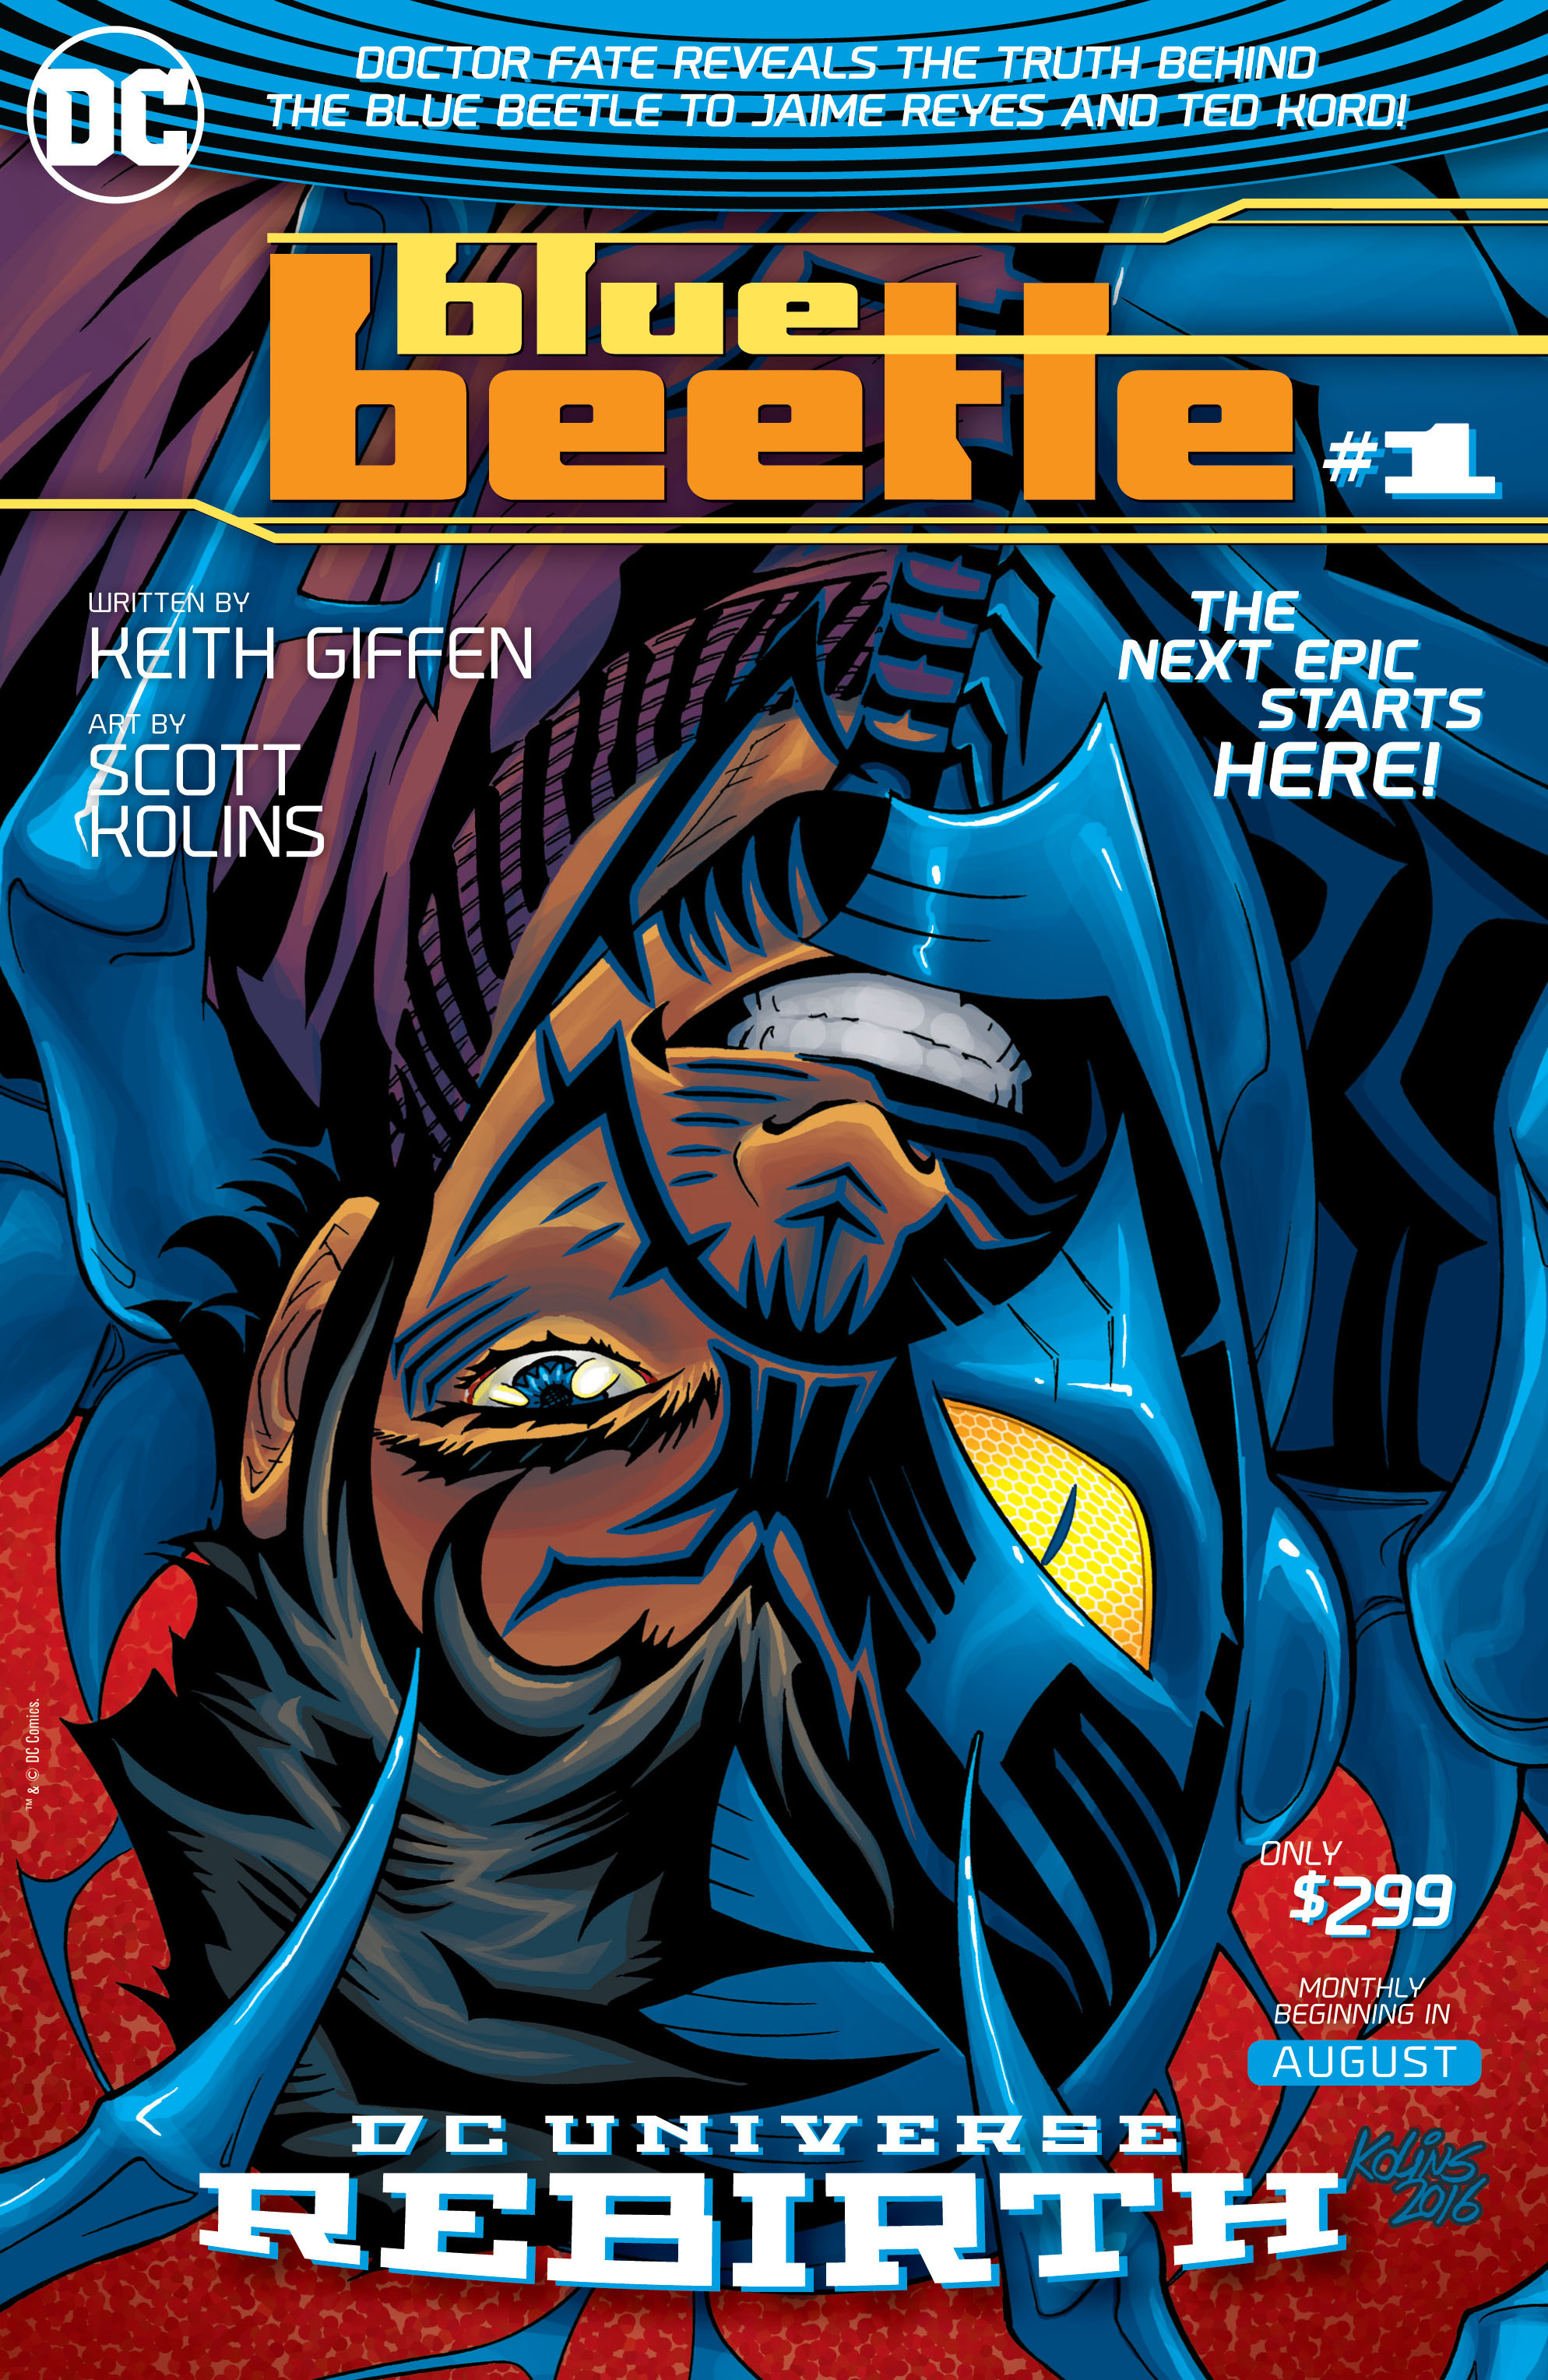 Read online Scooby Apocalypse comic -  Issue #4 - 2